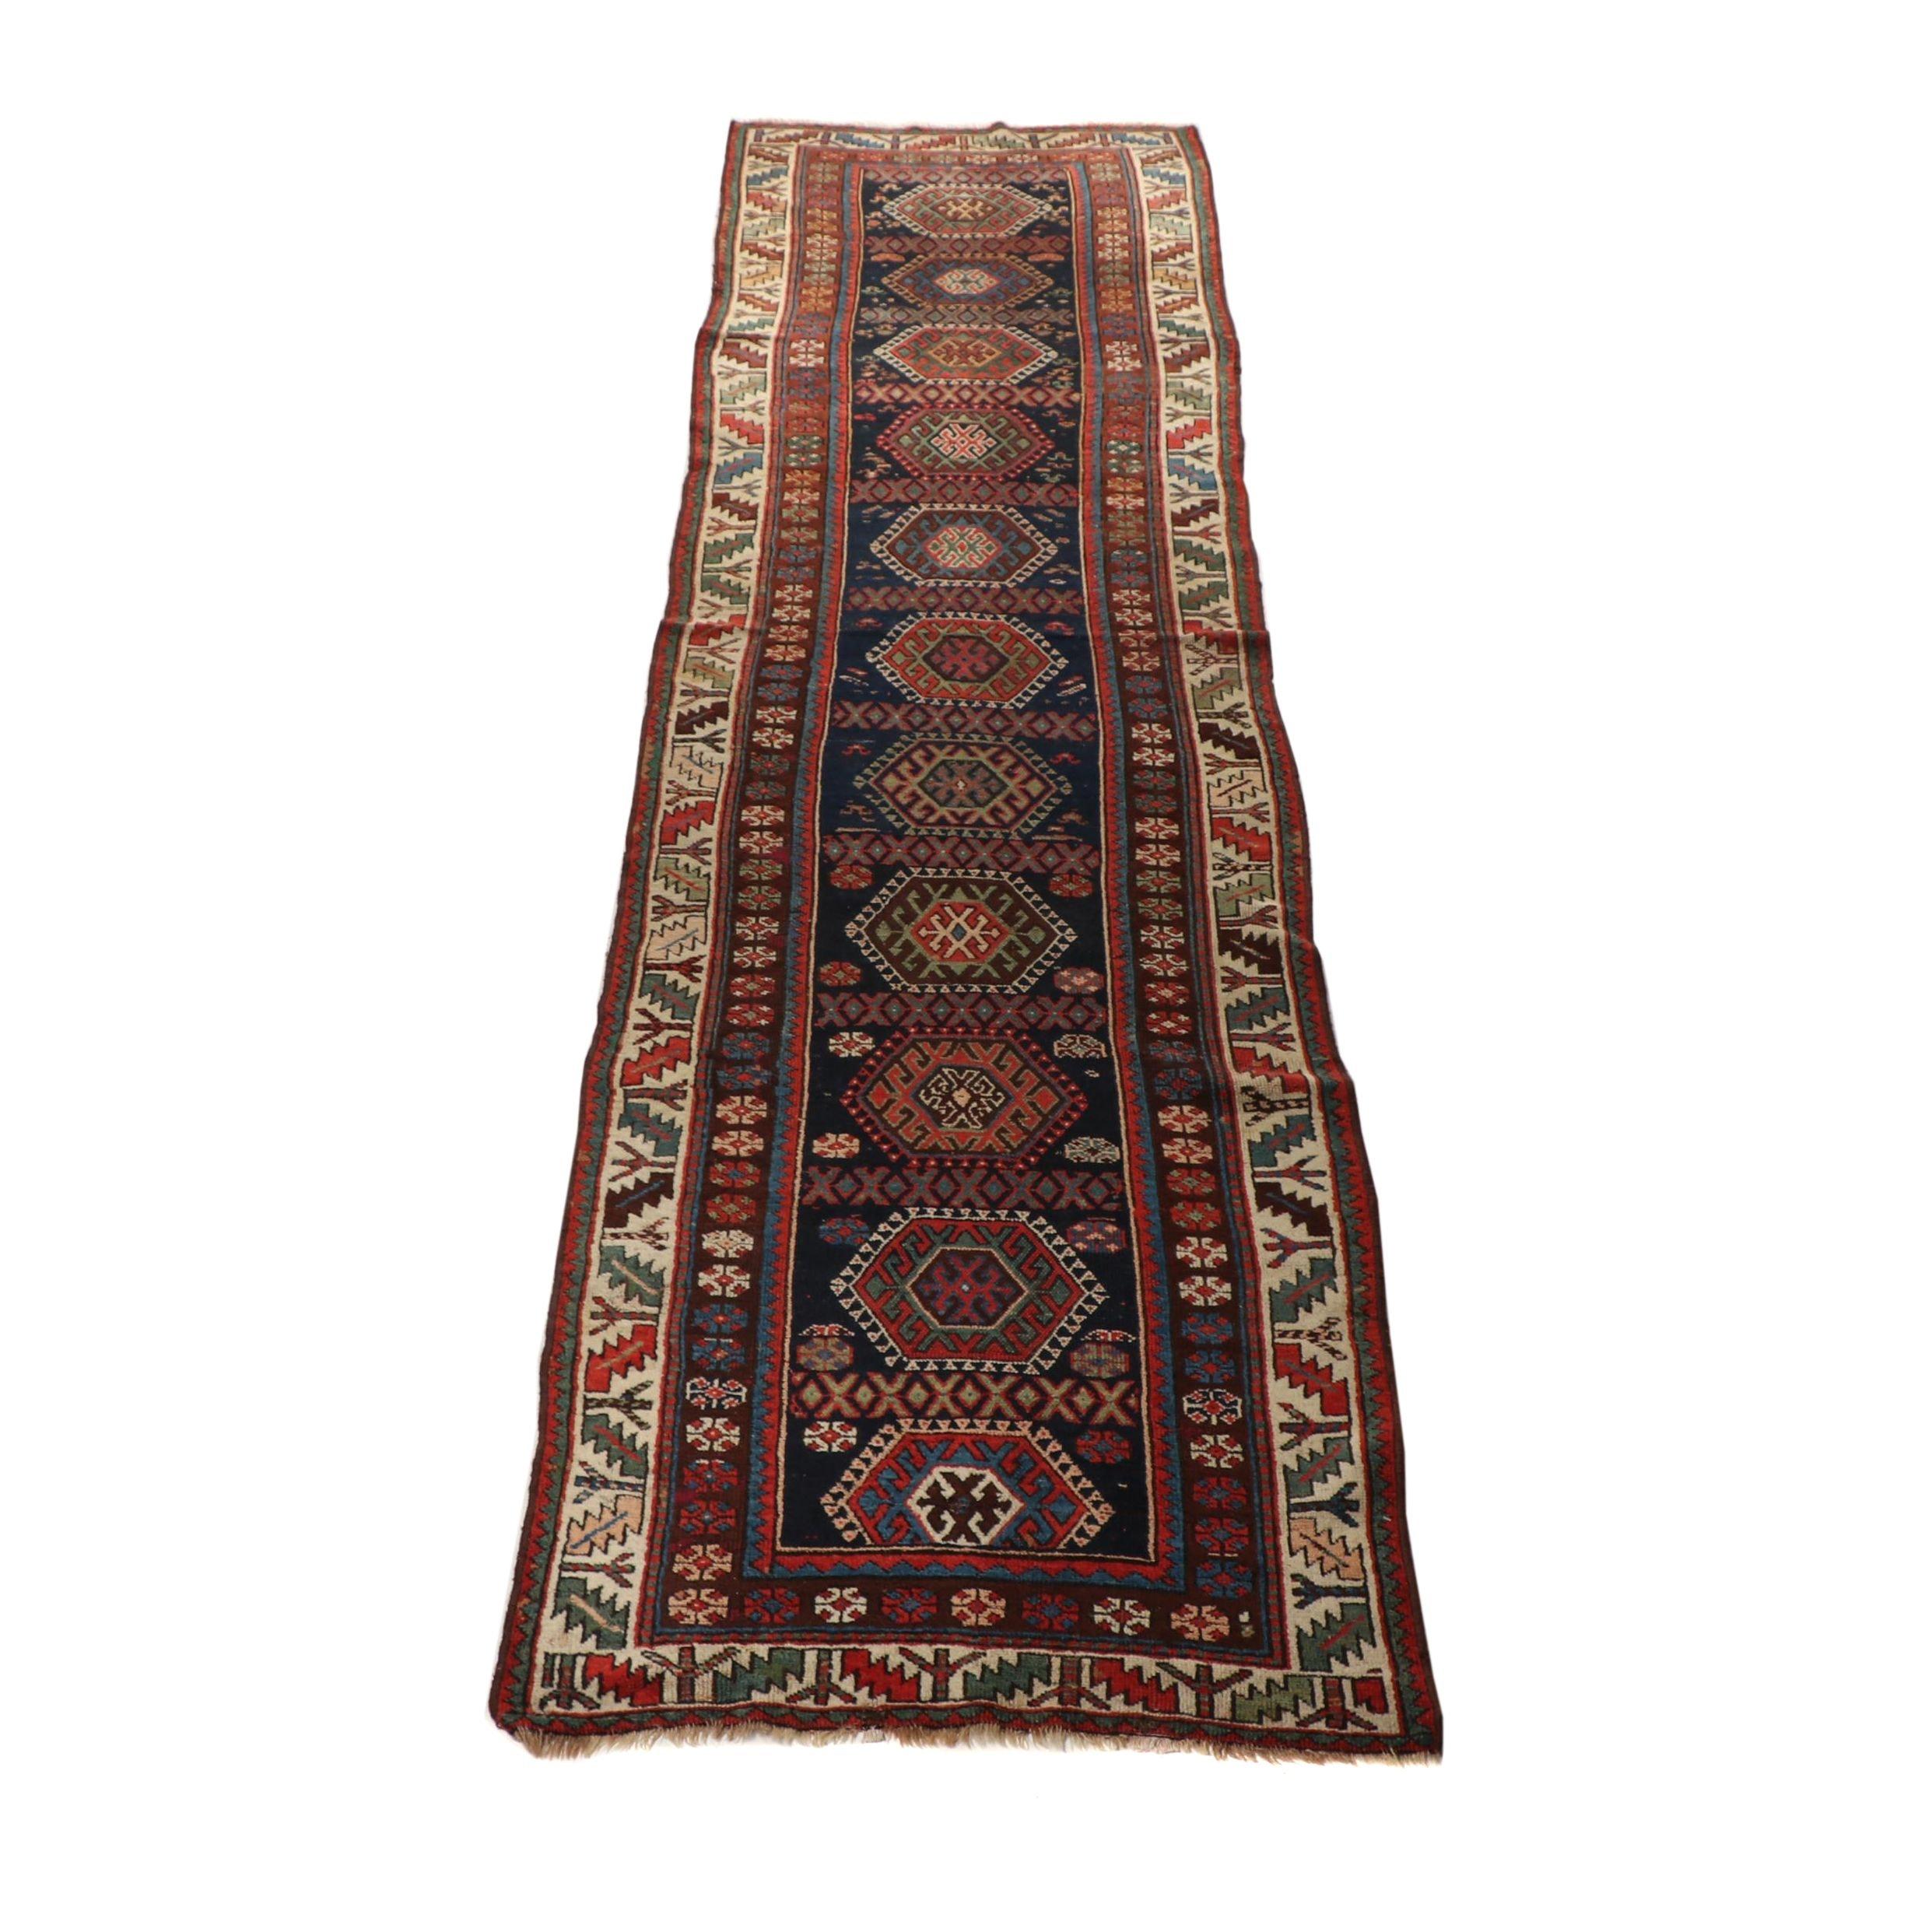 Hand-Knotted Iraqi Wool Carpet Runner